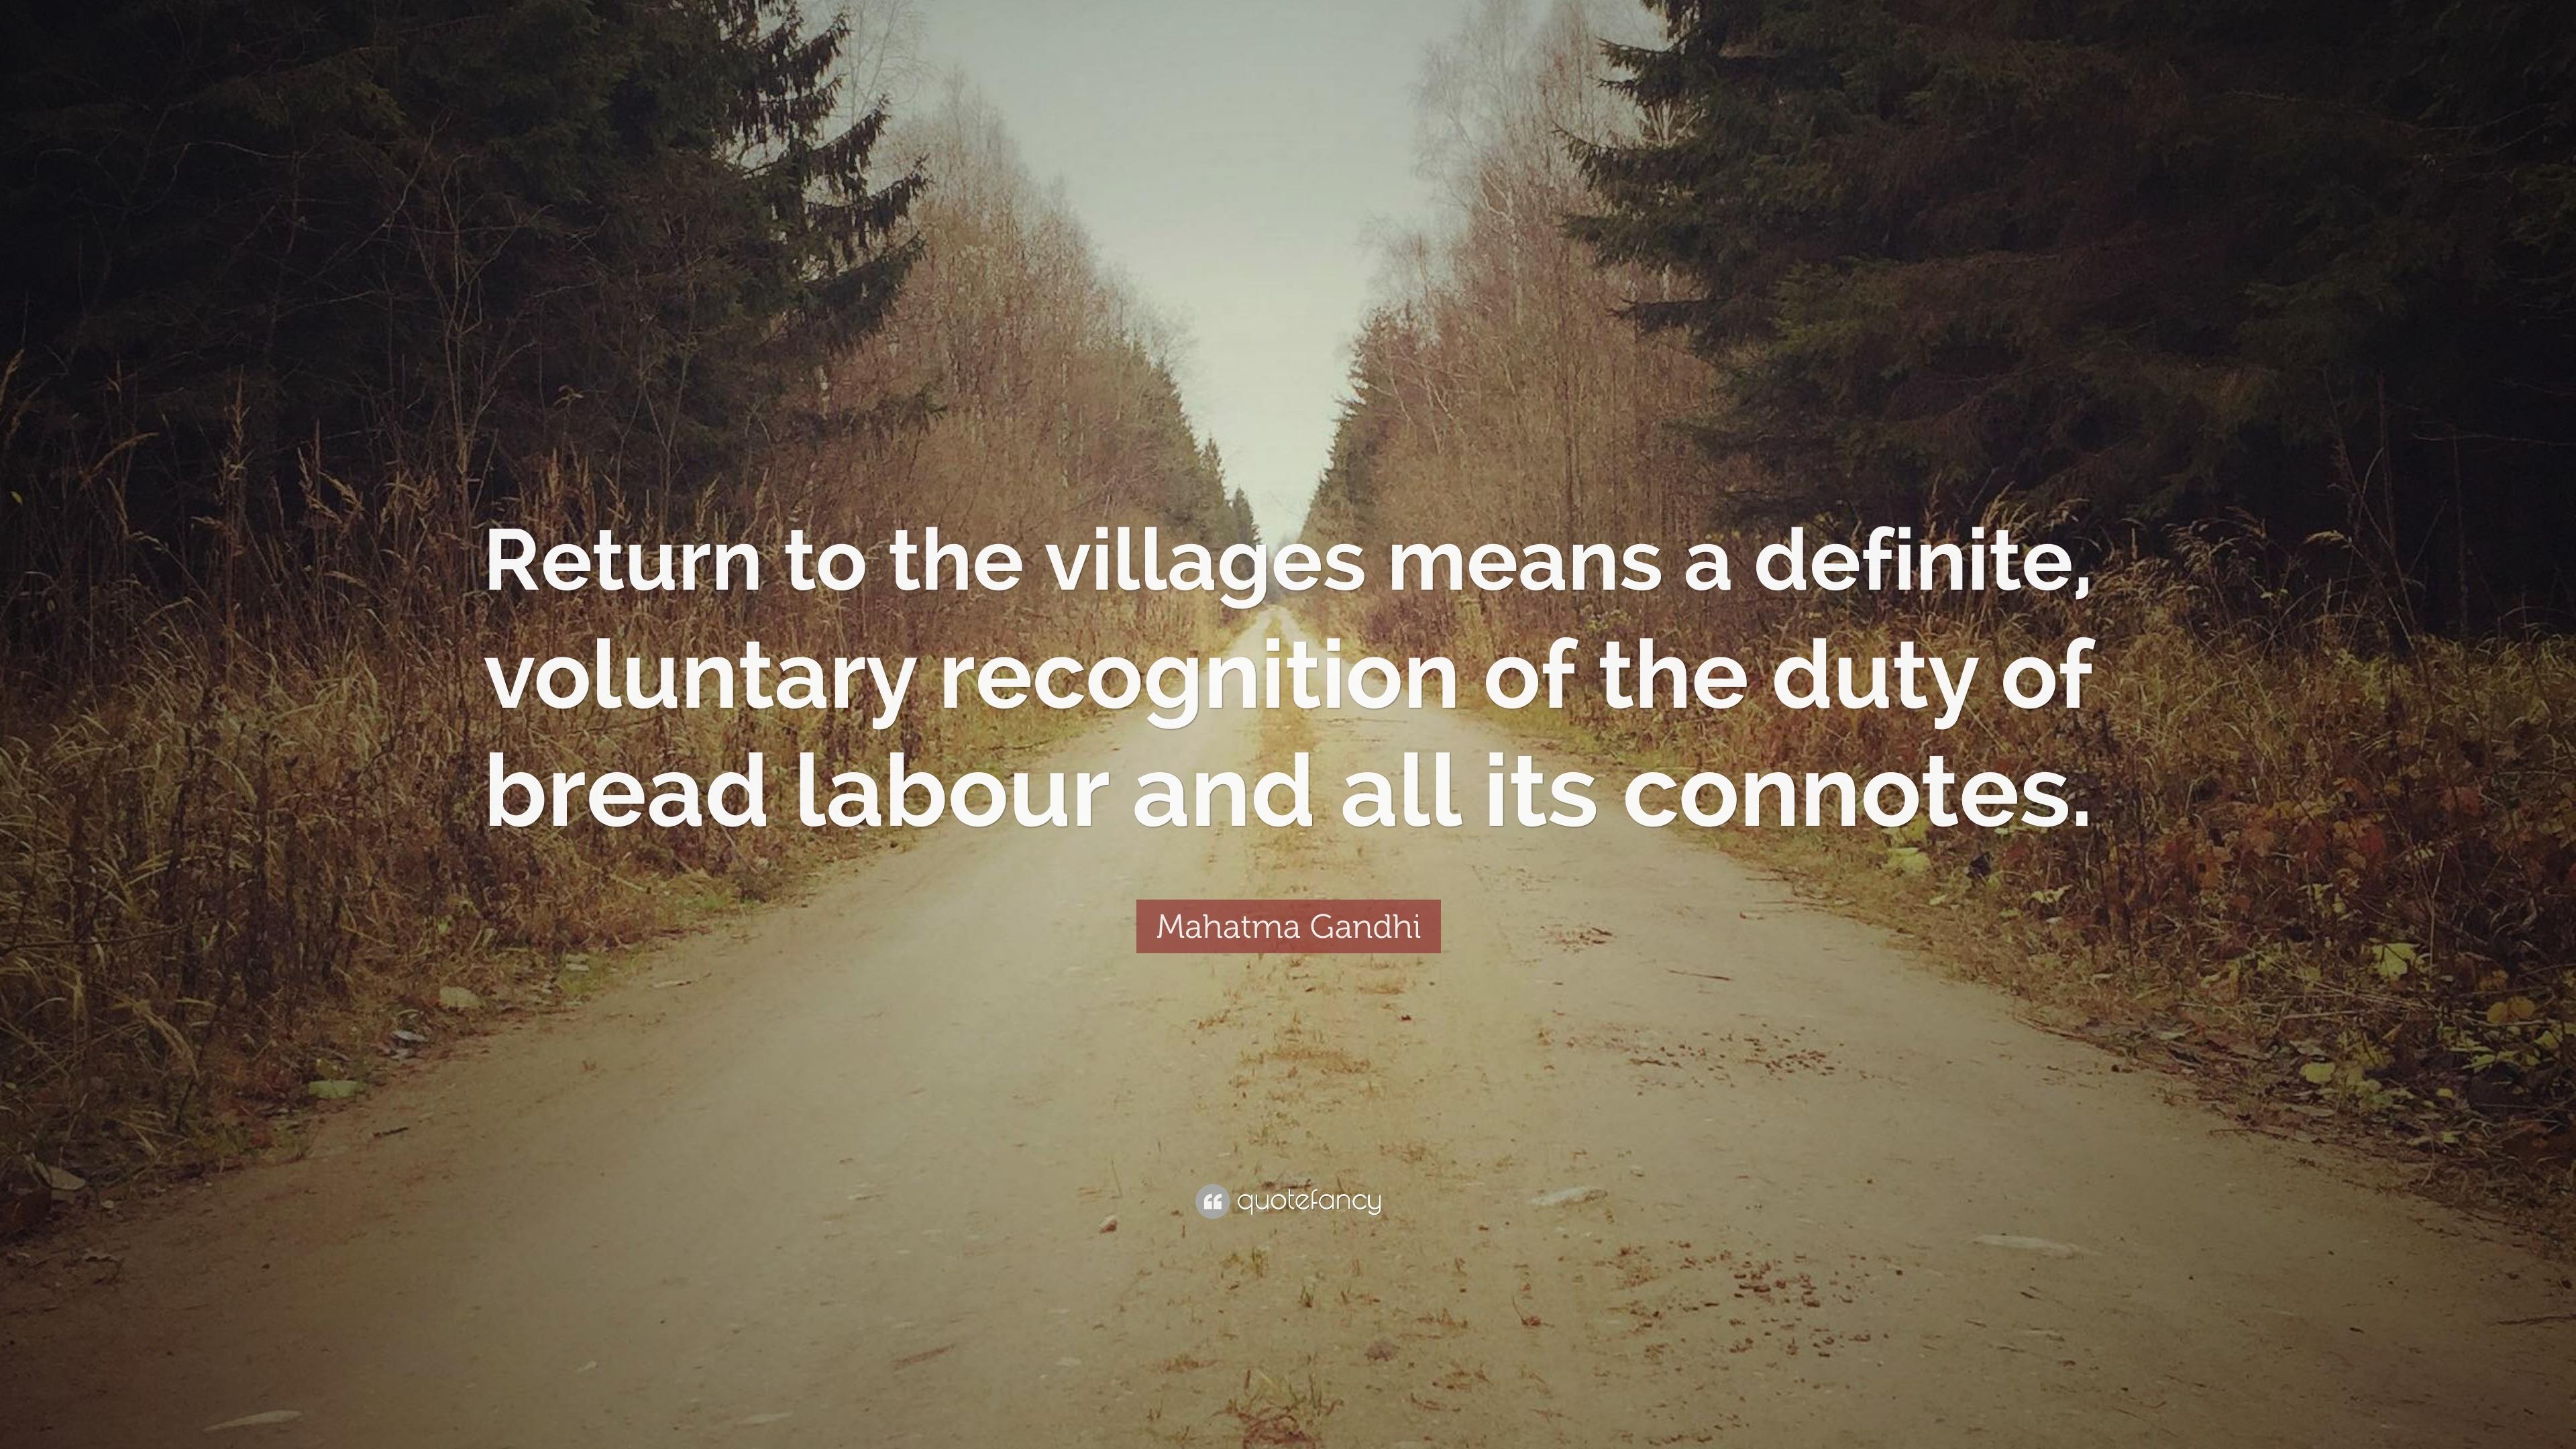 gandhi quotes on villages